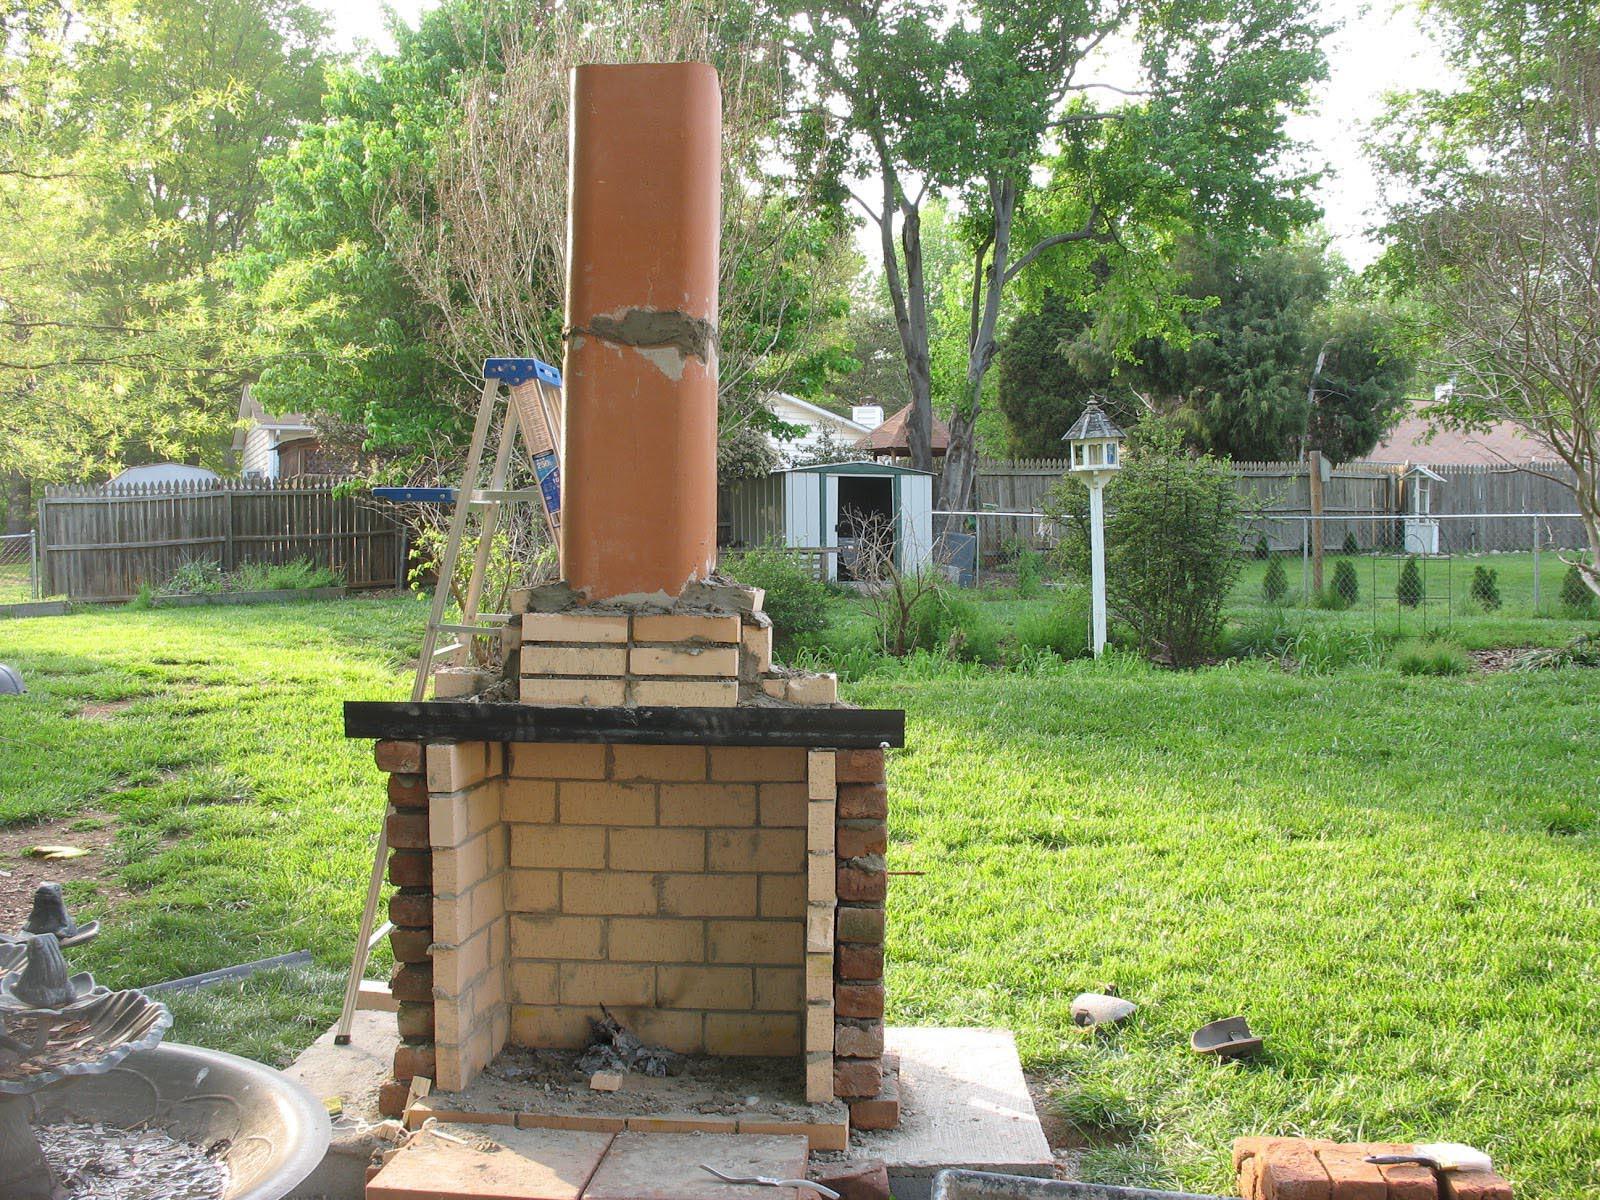 DIY Fireplace Outdoor  Diy Outdoor Fireplace is Perfect Idea